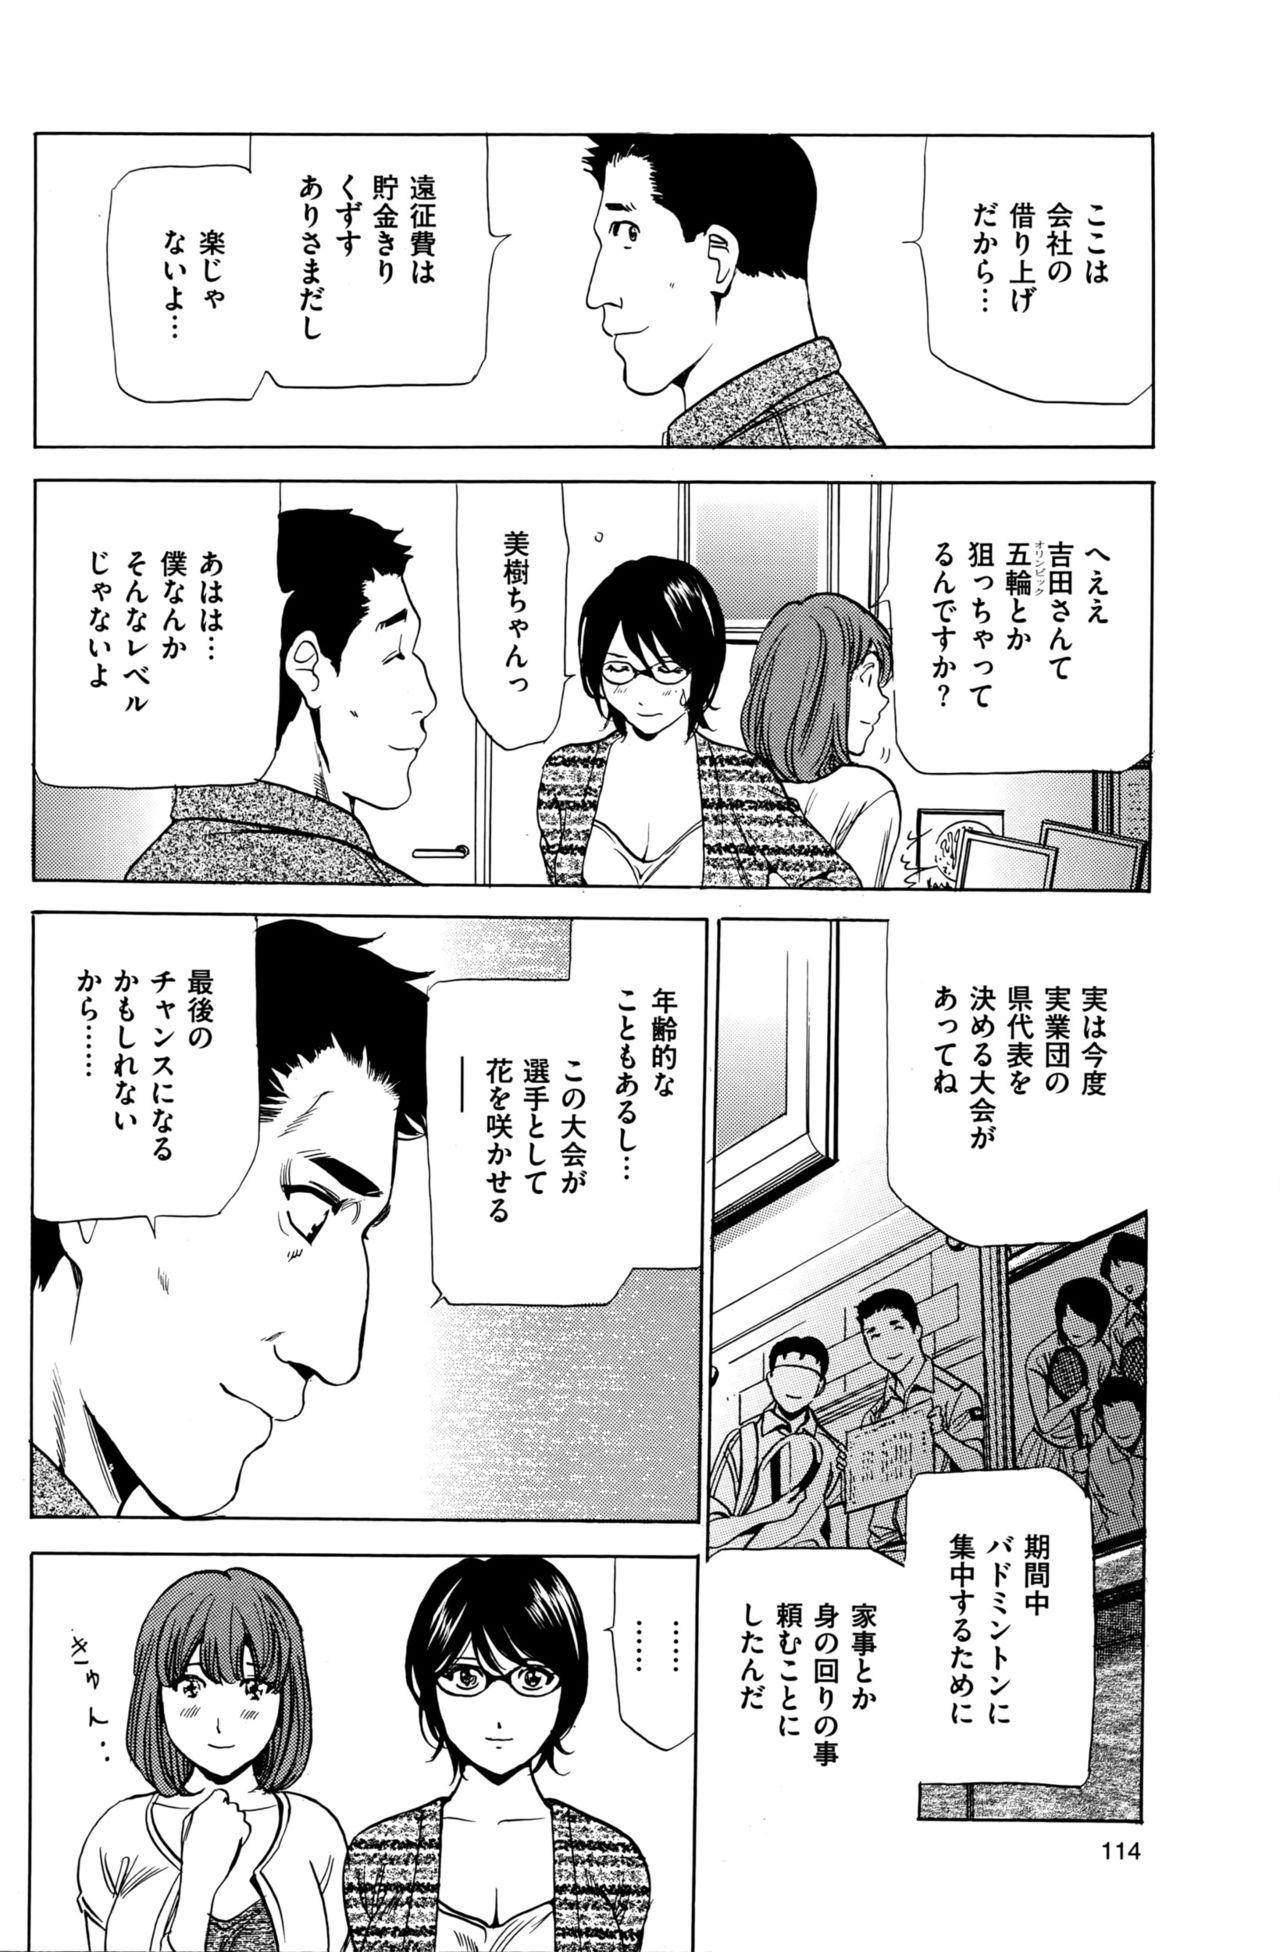 Wa Usuki Ipa a 1-10 40